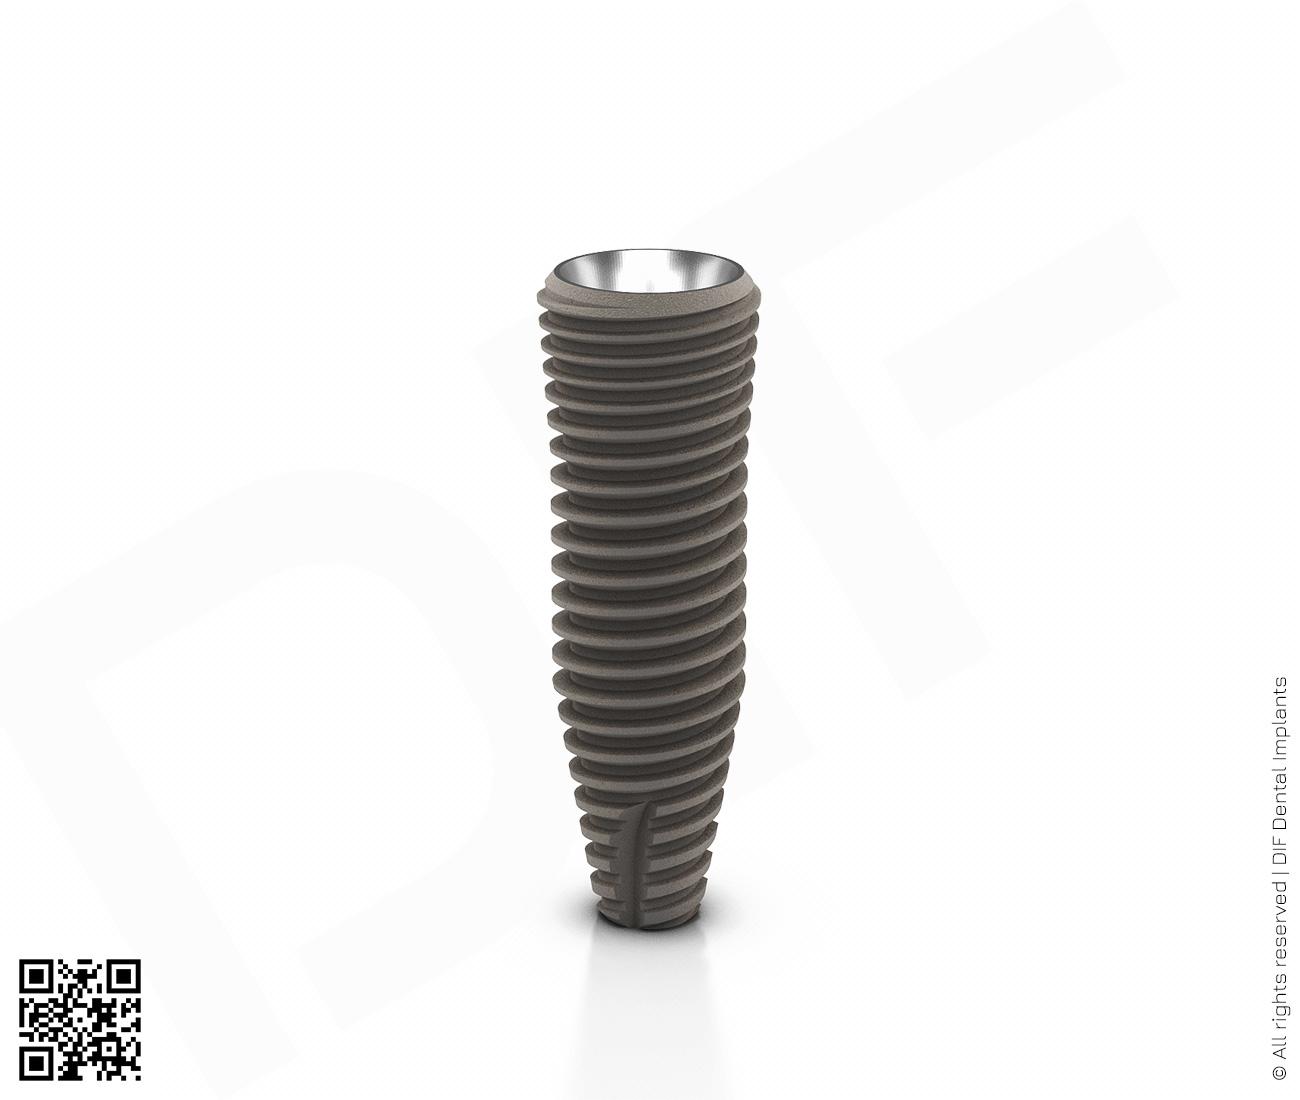 Фото имплантат mainstream fine d4.2 мм – l13.0 мм производства DIF.